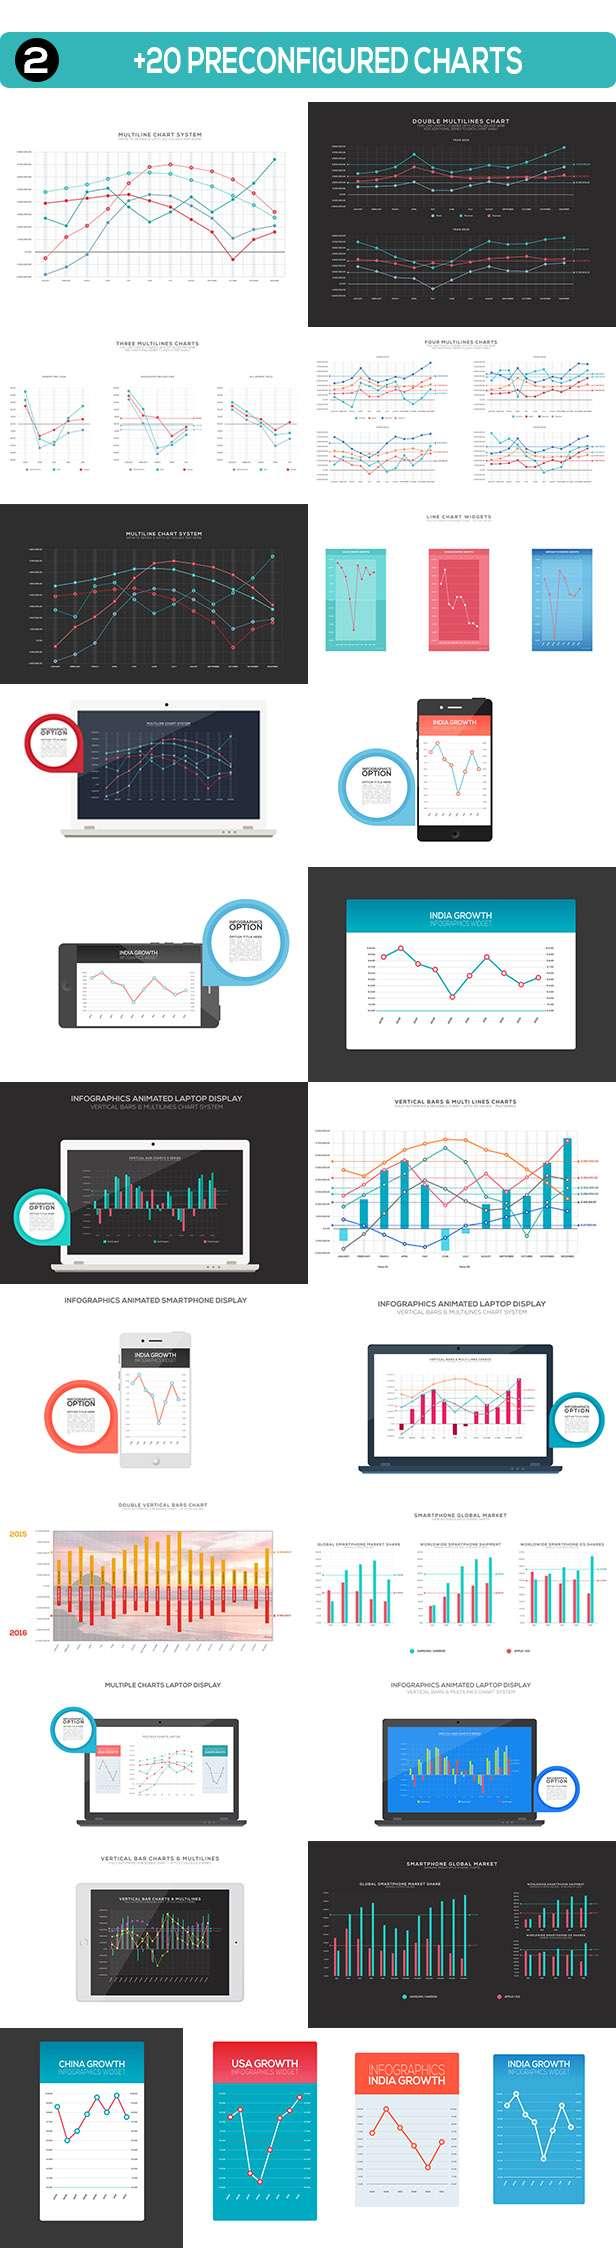 4K NextGen statistics Charts pack one Preconfigured Included Charts